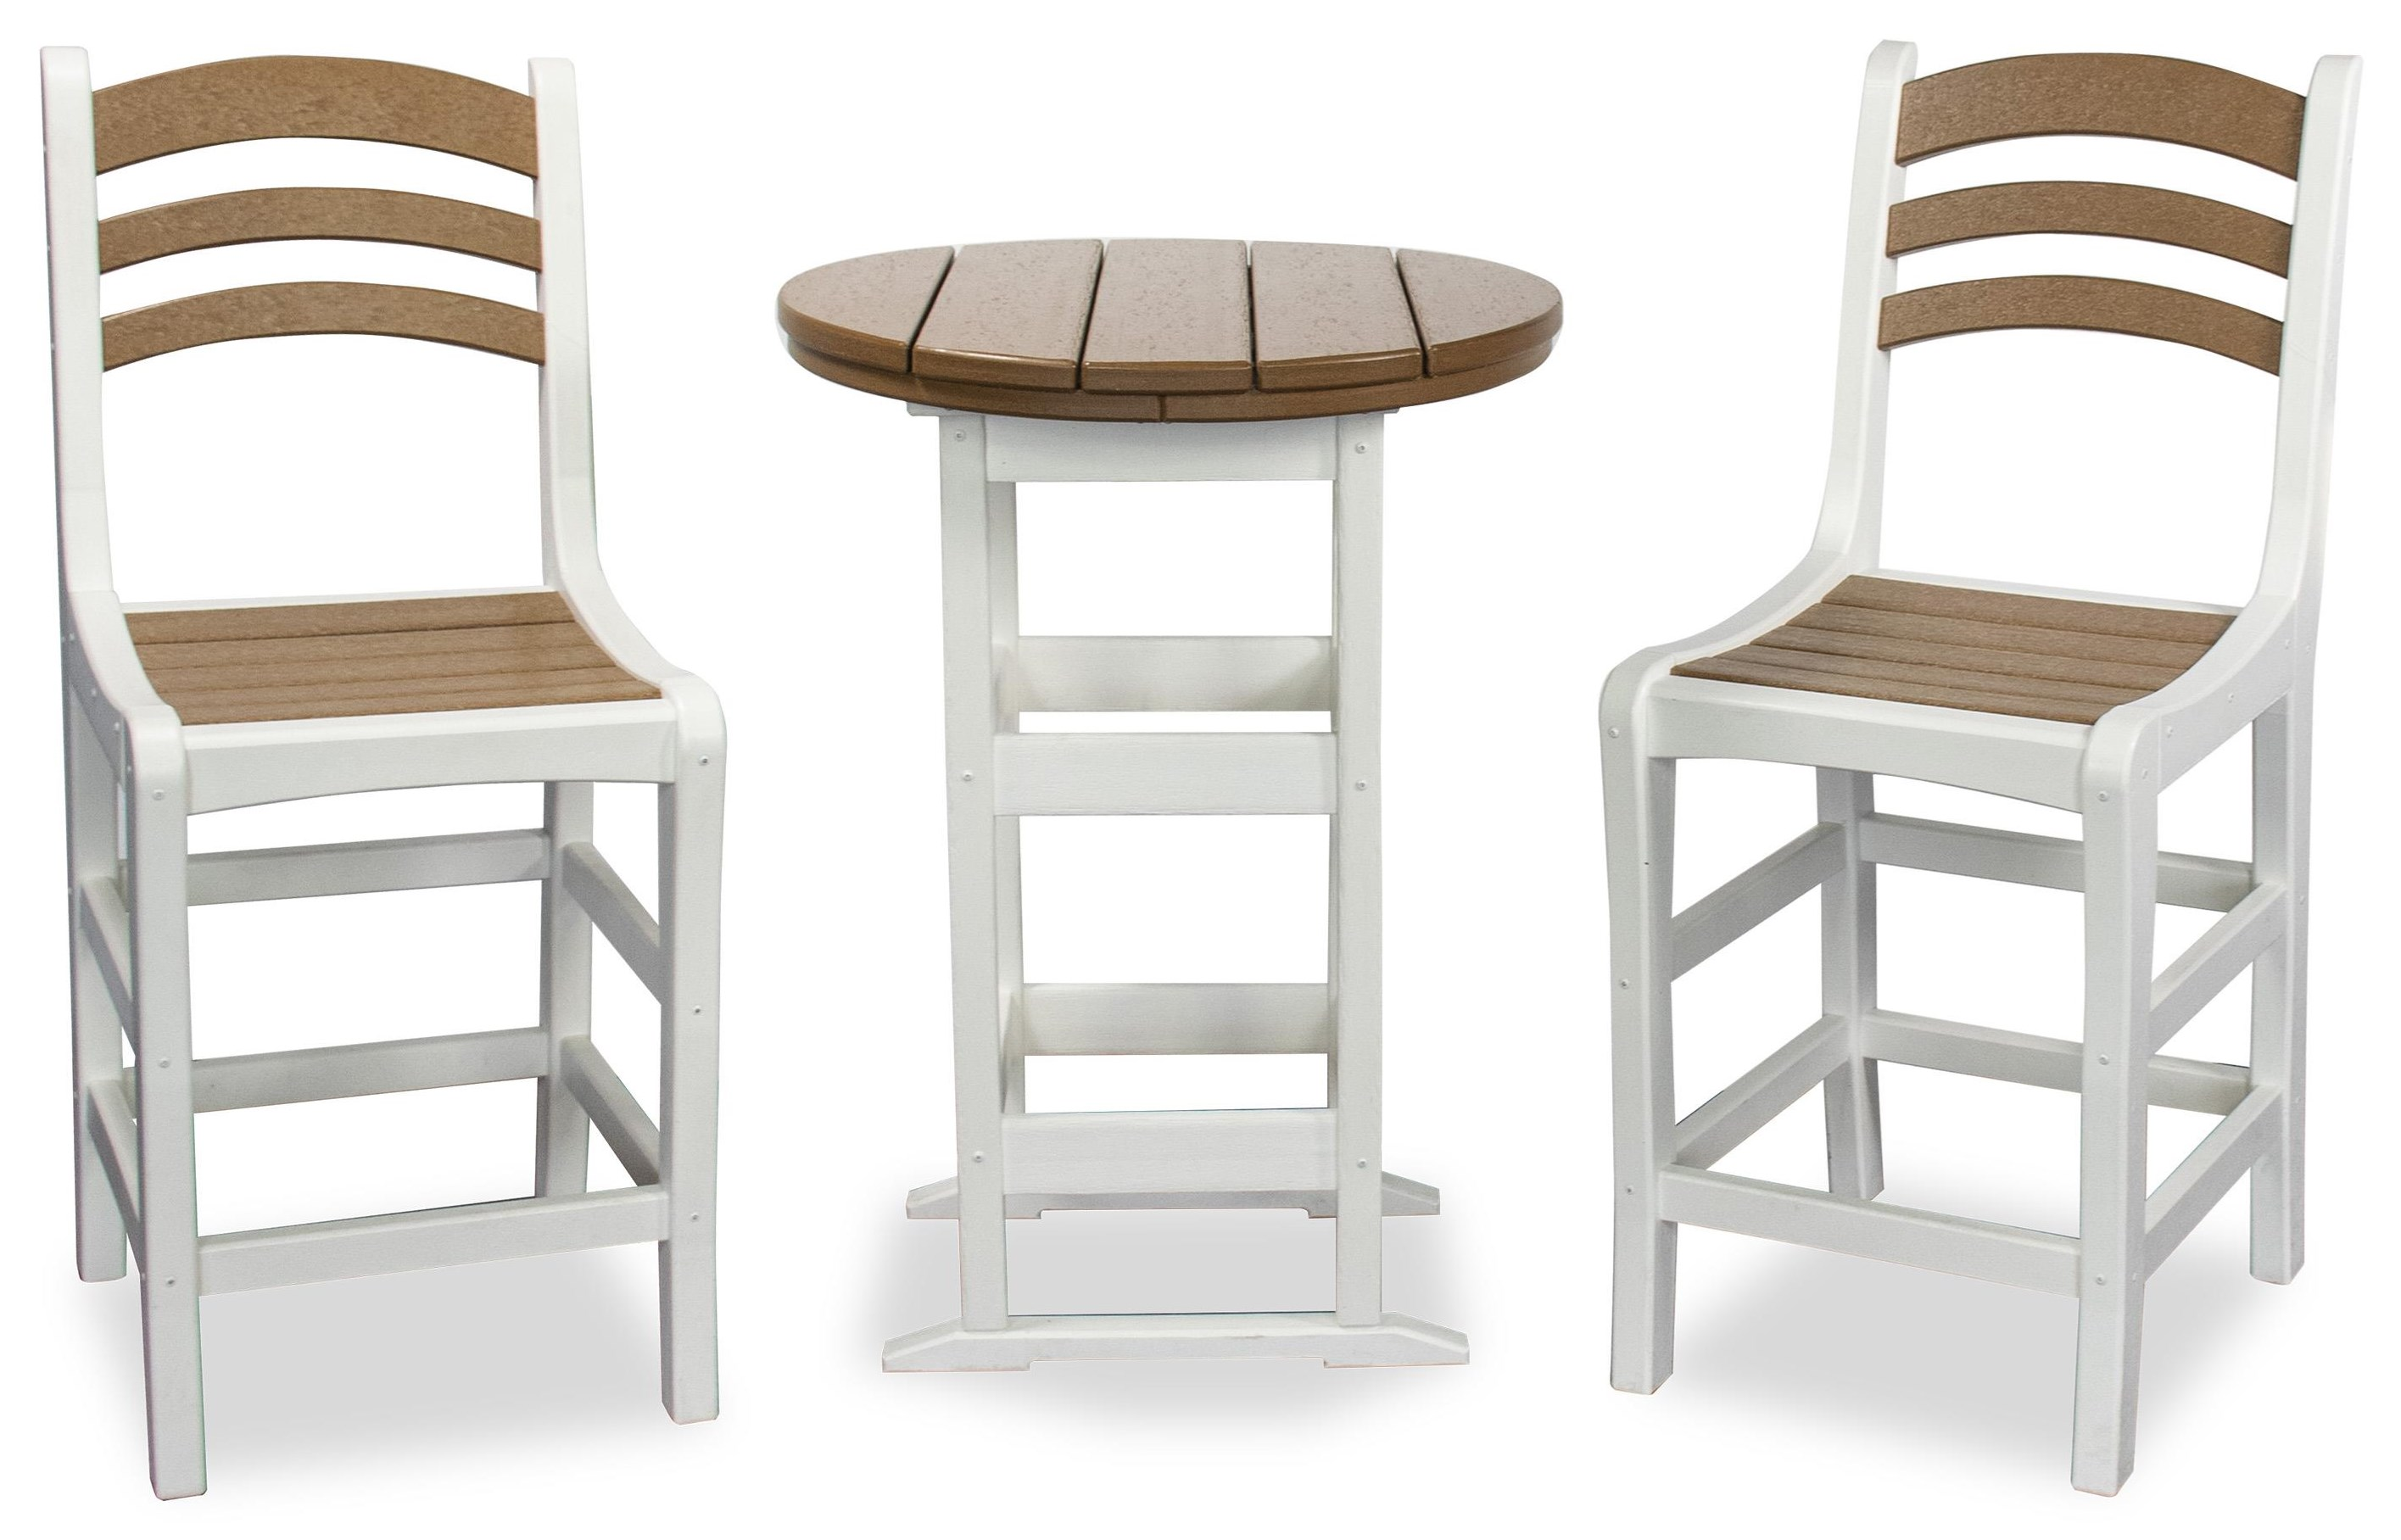 Avanti Counter Table and 2 Stools by Breezesta at Johnny Janosik